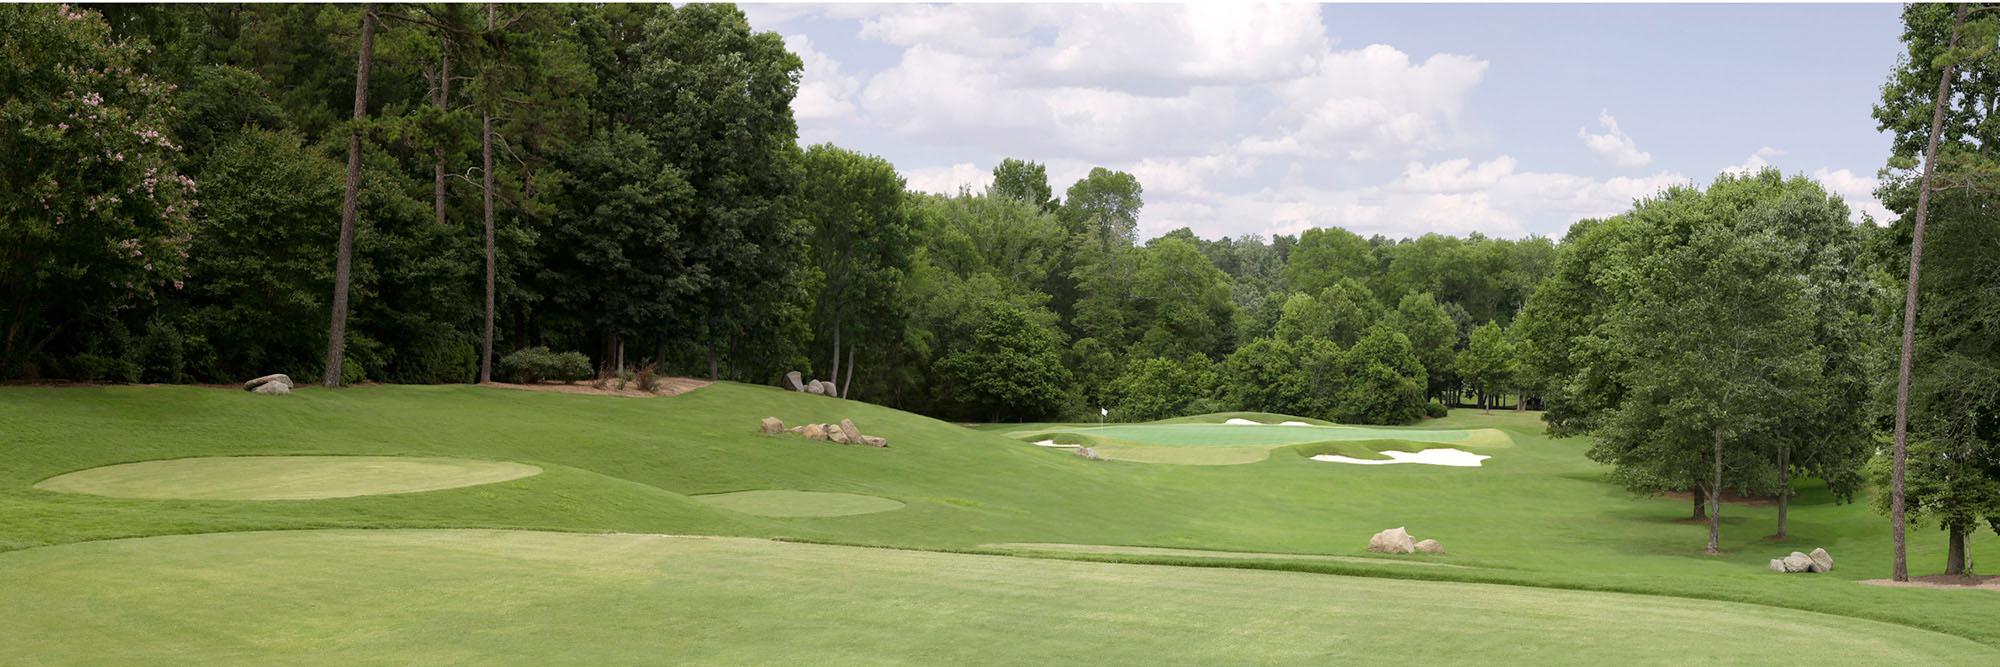 Golf Course Image - River Run Country Club No. 4